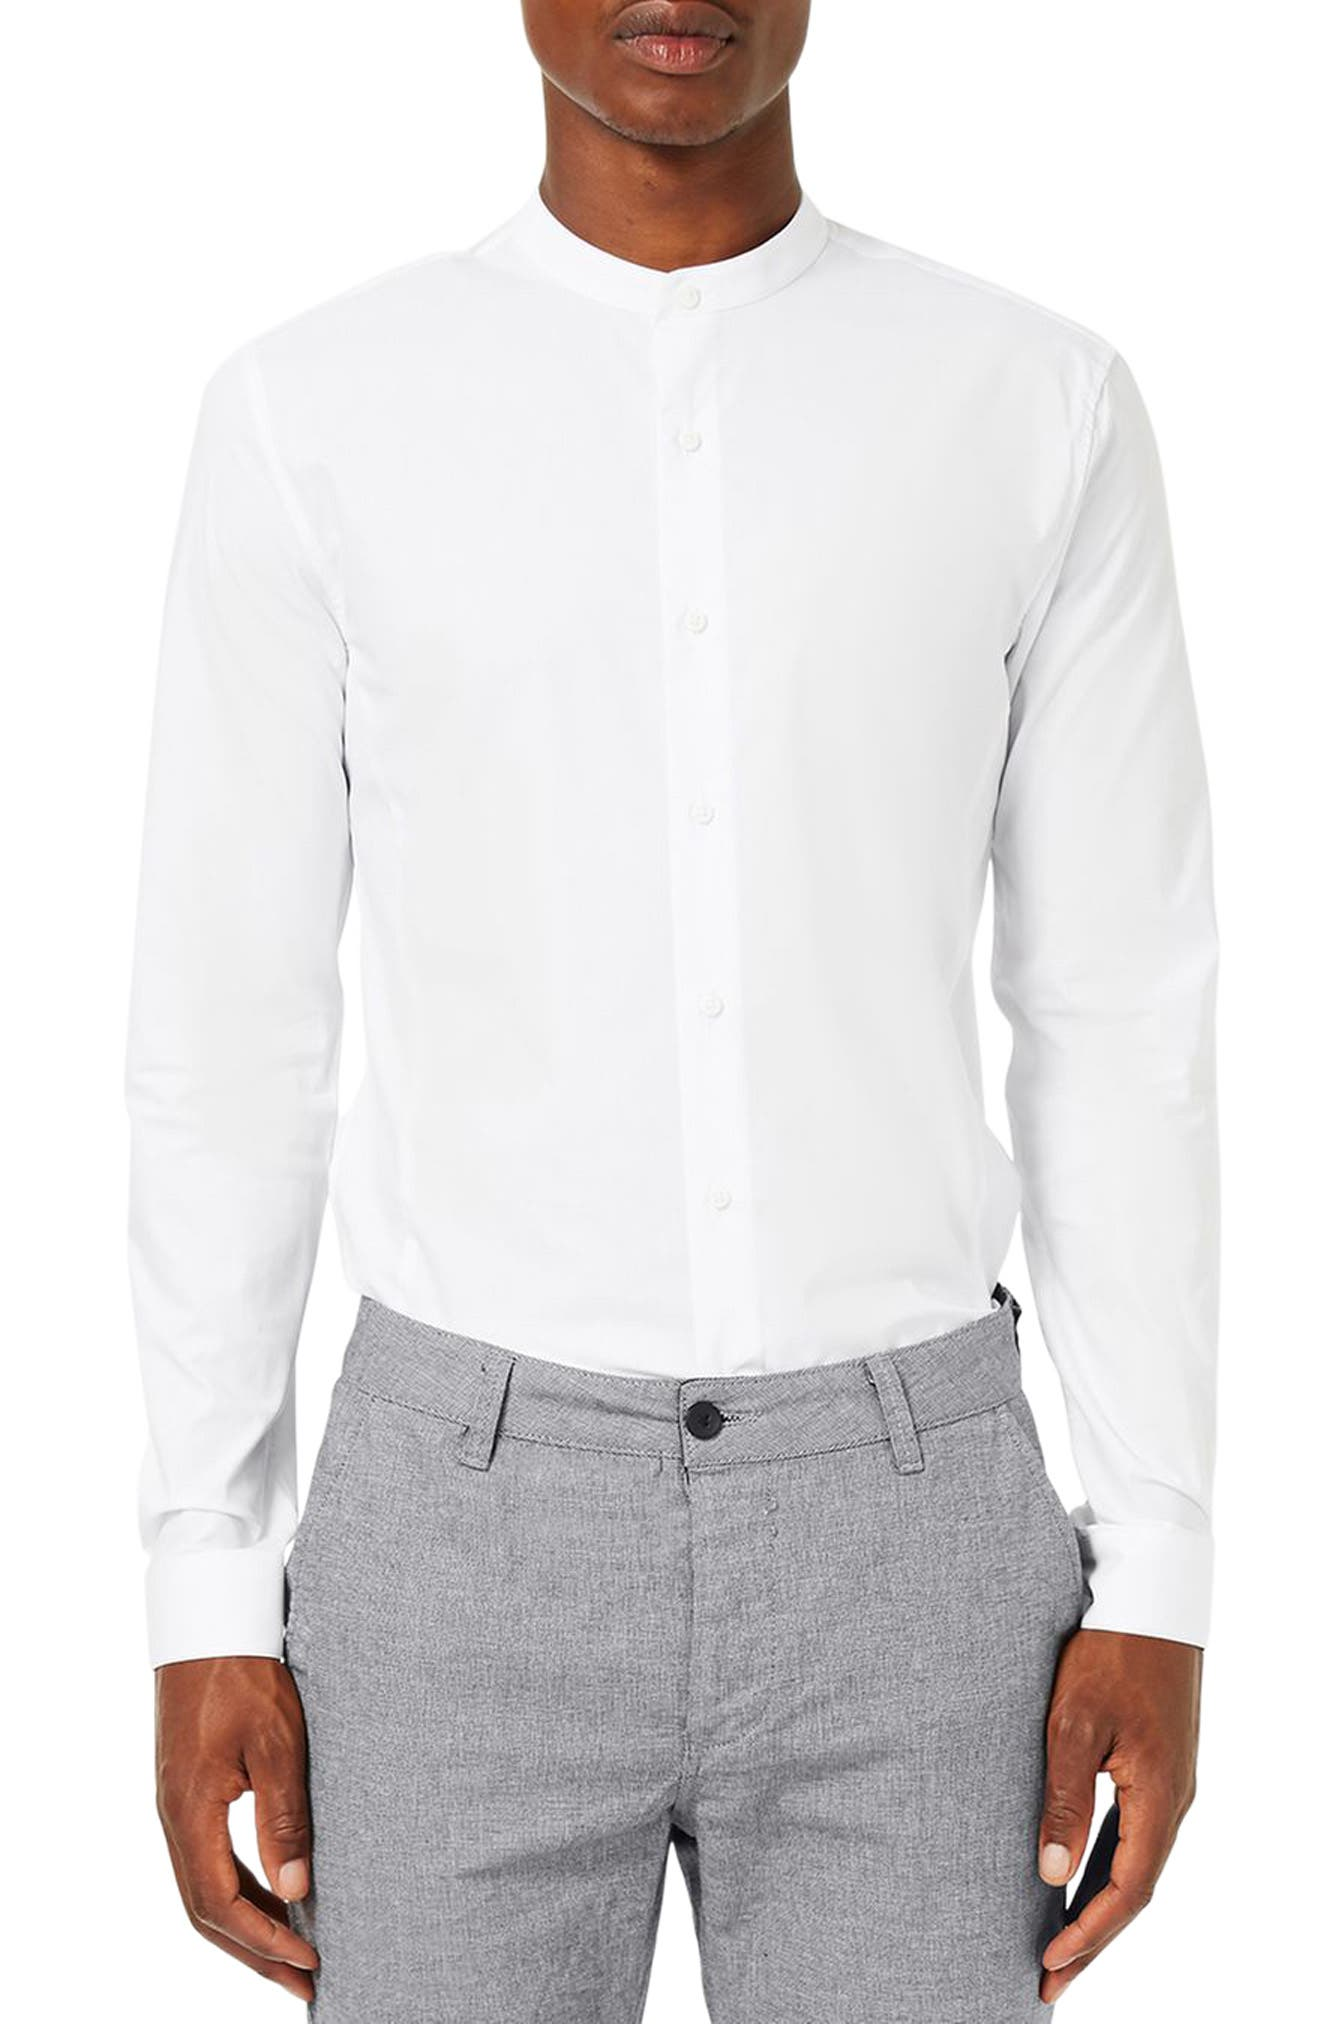 Band Collar Skinny Fit Dress Shirt,                             Main thumbnail 1, color,                             White